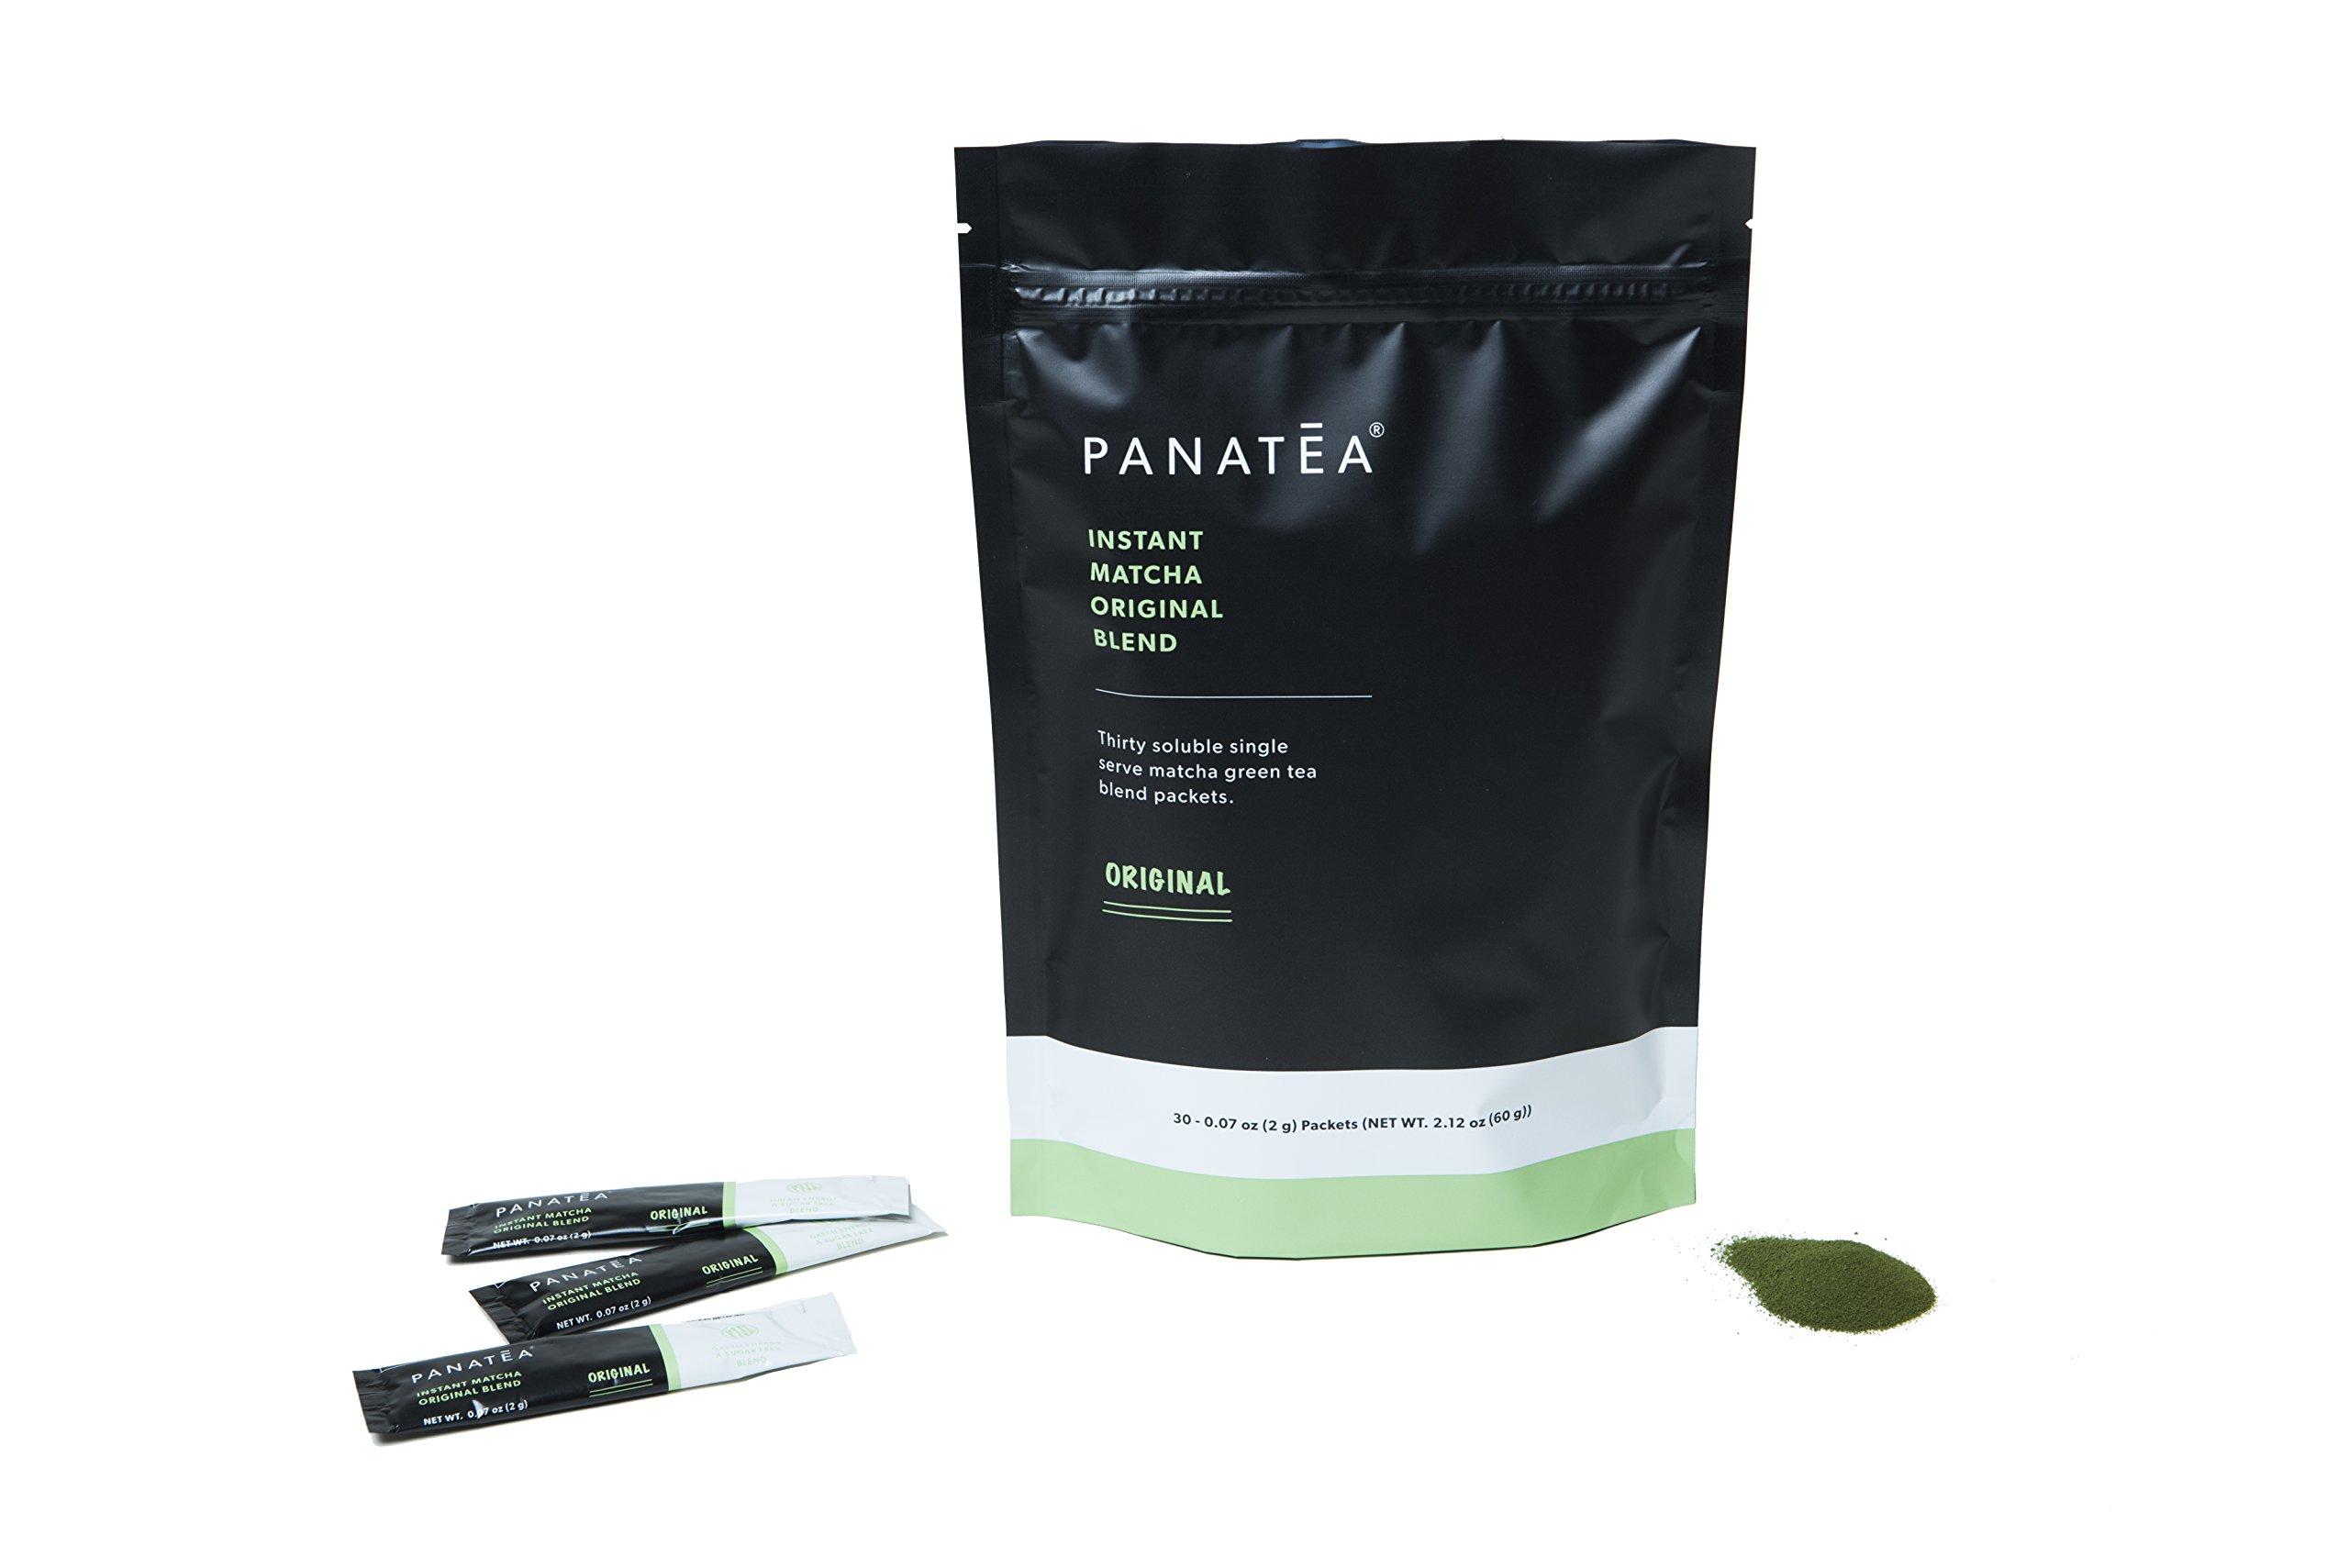 PANATEA Instant Matcha Packets Ceremonial Grade Green Tea Powder Single Serving Matcha On The Go Travel Packs (30 Unit Bag)